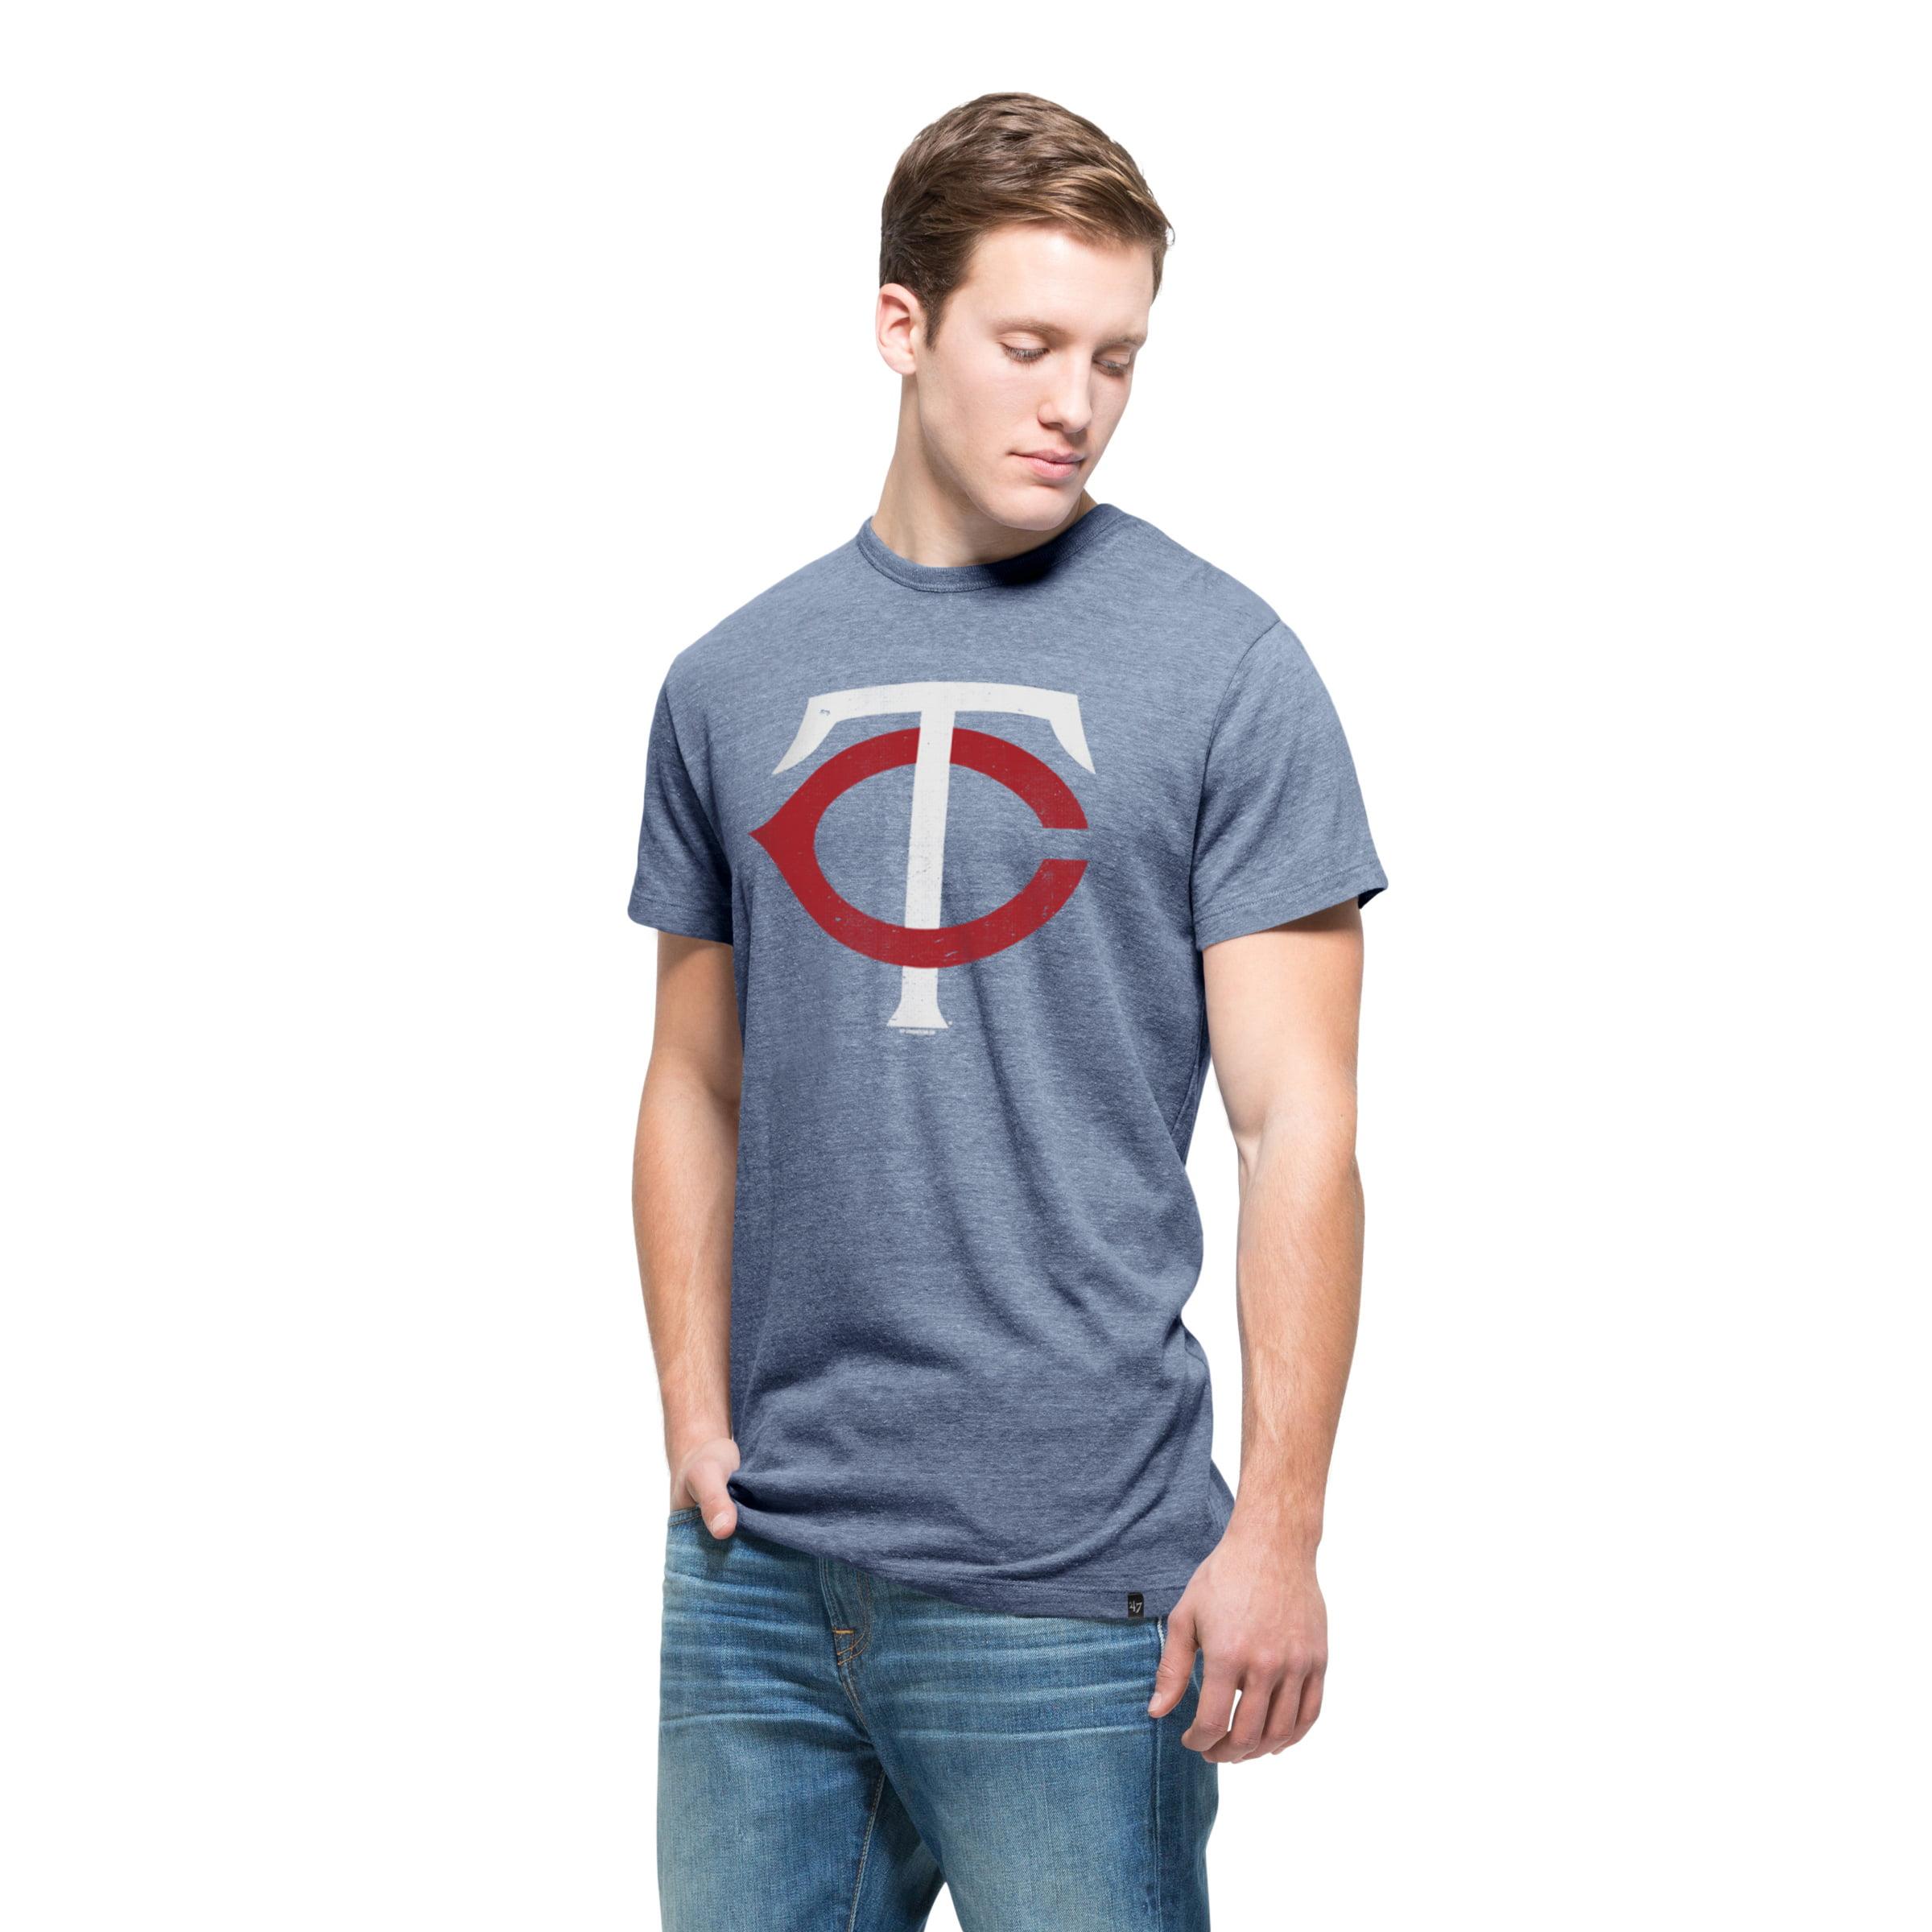 Minnesota Twins '47 Tri-Blend State T-Shirt - Navy